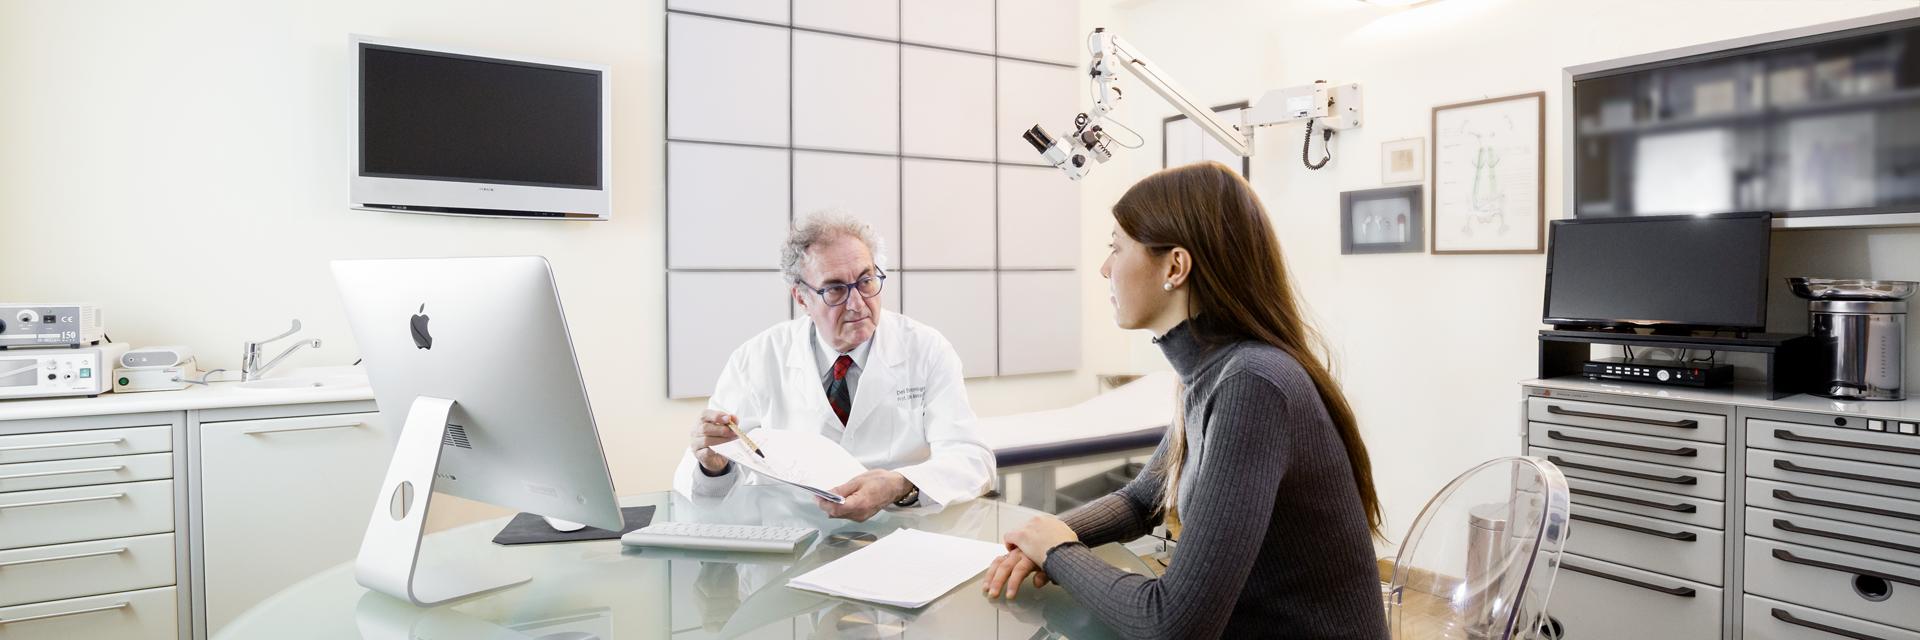 acufene-paziente-medico